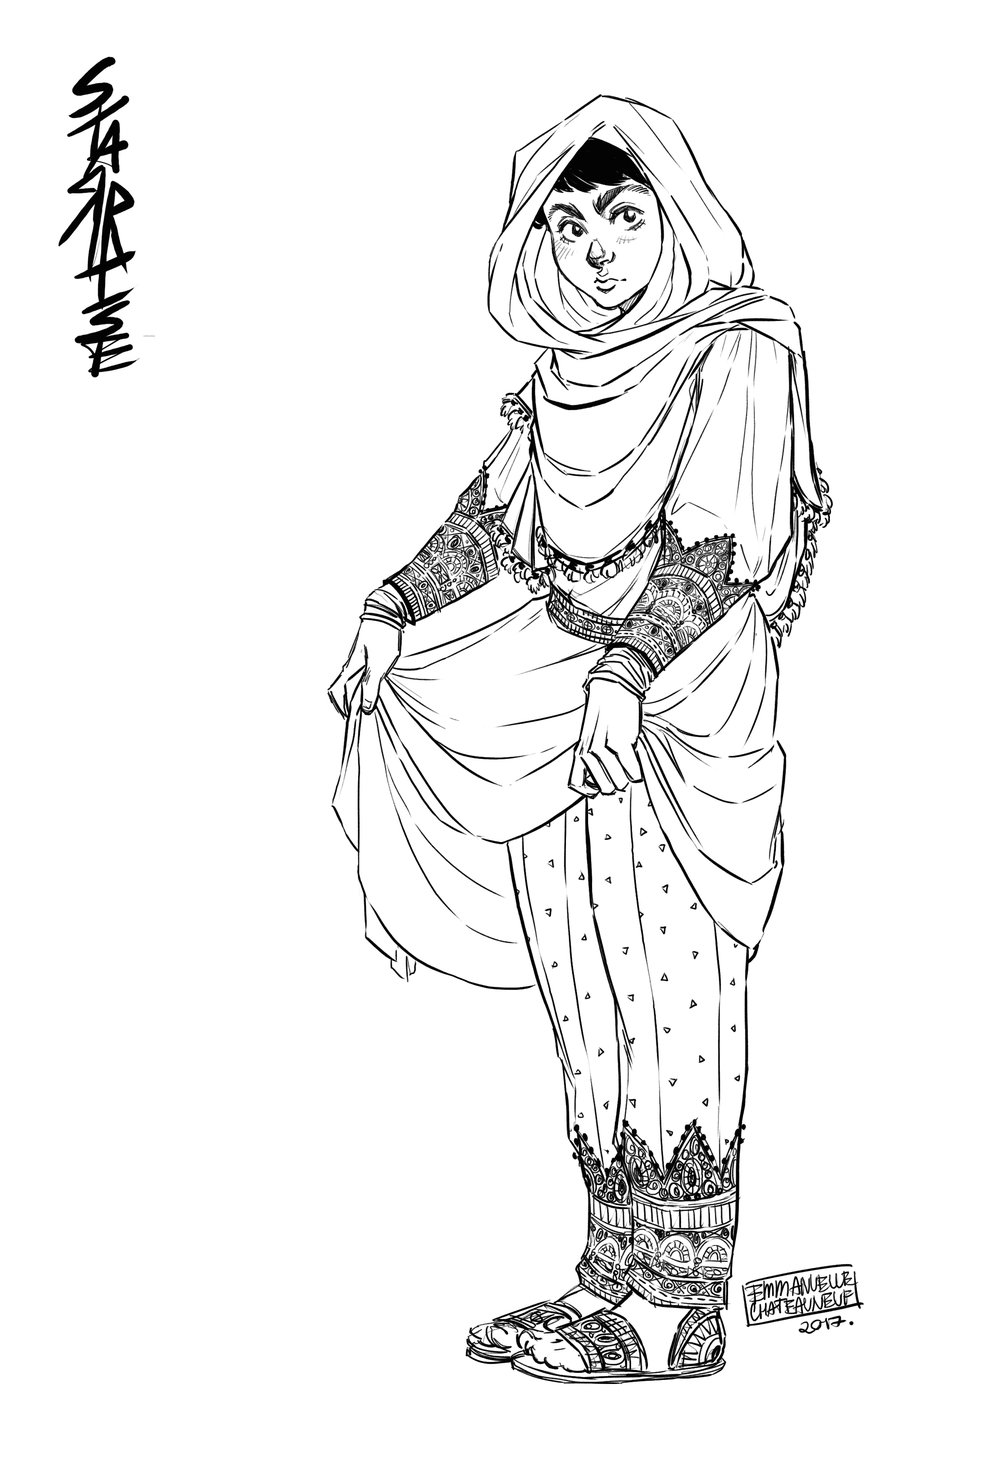 Starrise_Sketches6.jpg